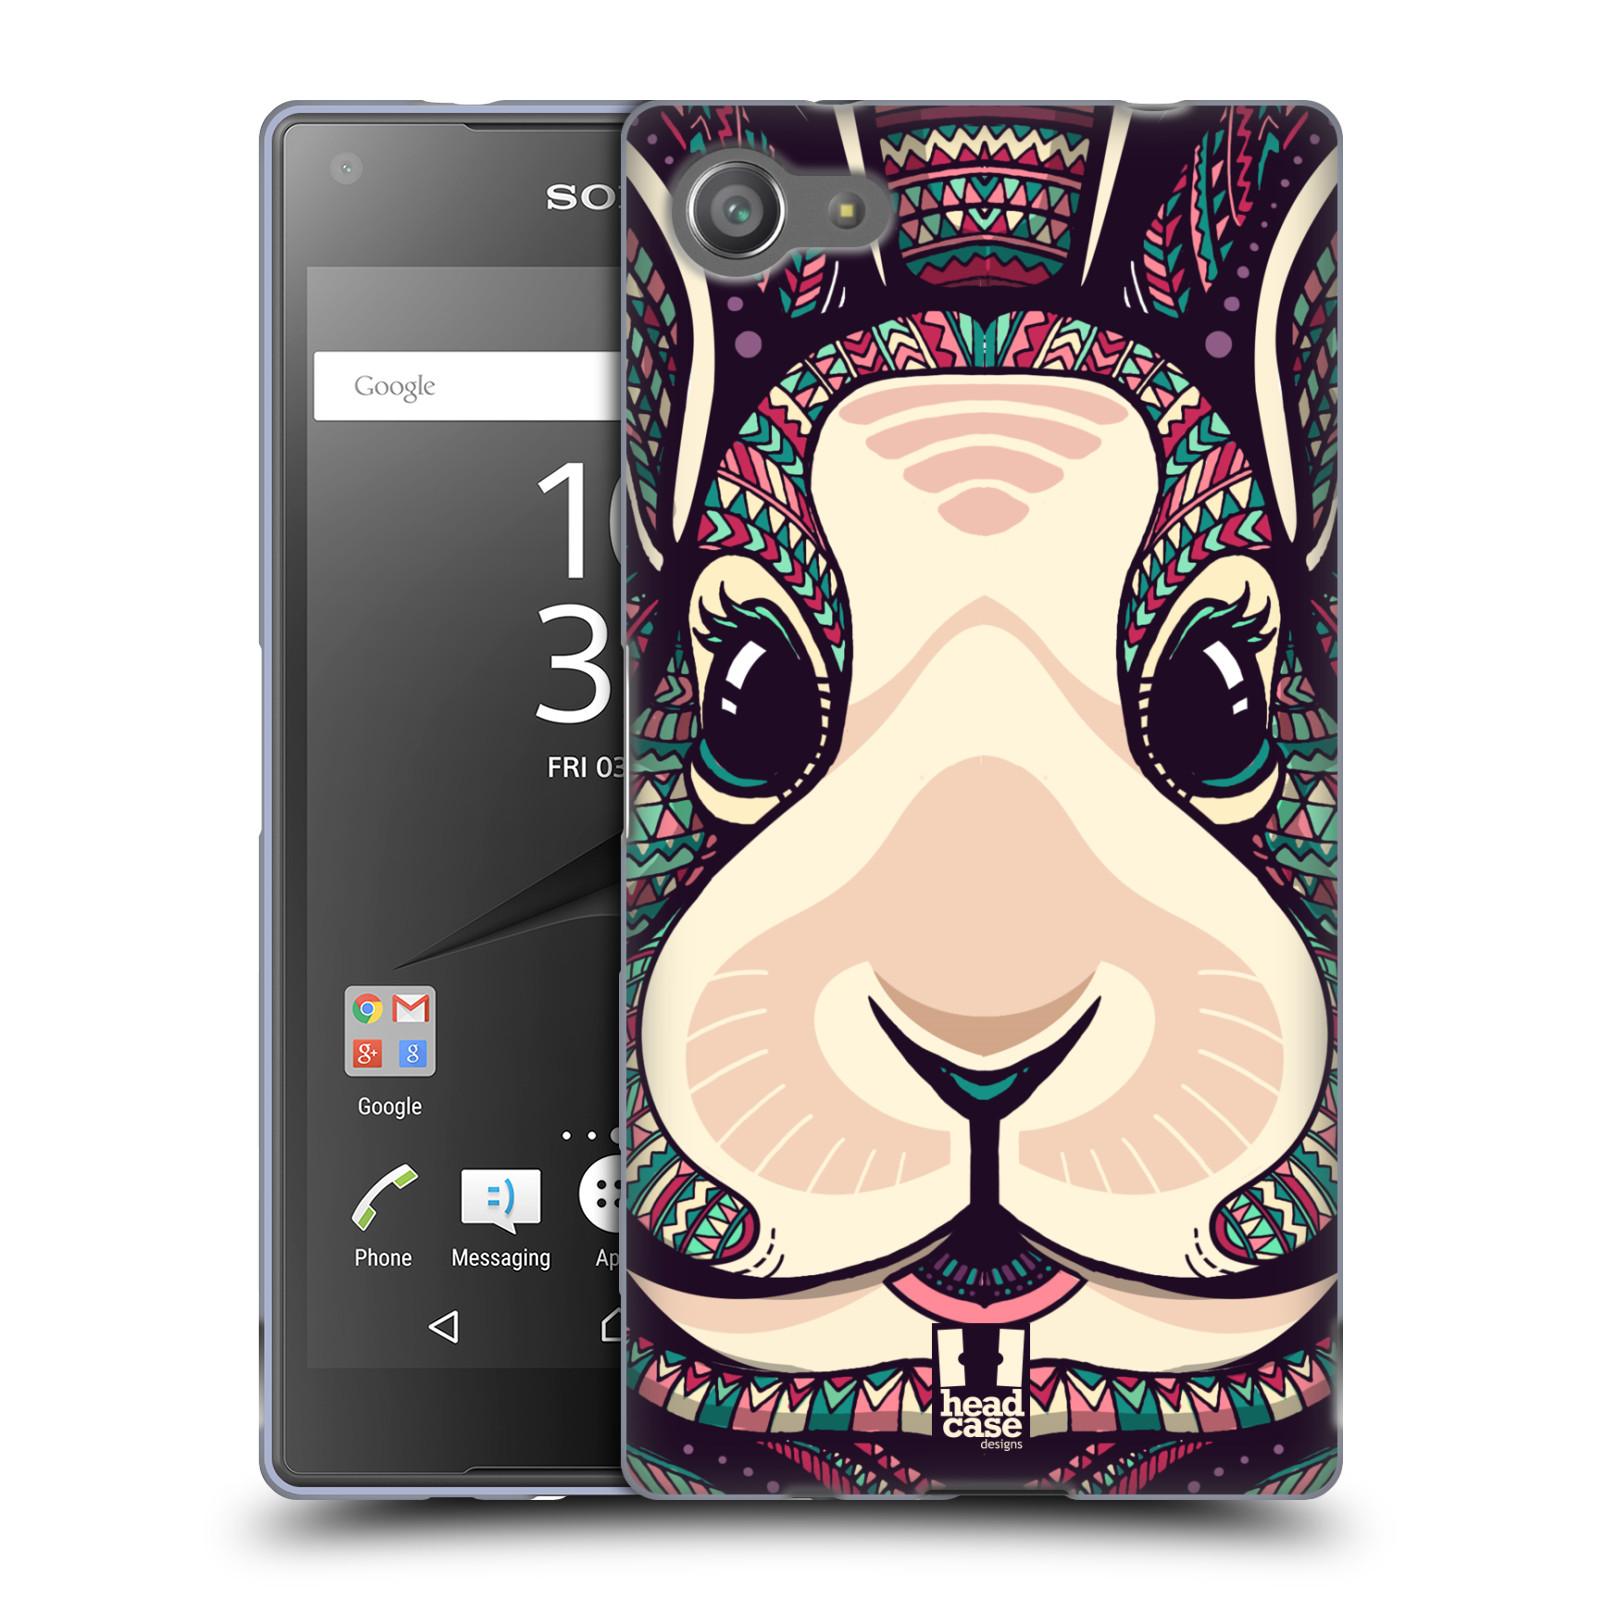 Silikonové pouzdro na mobil Sony Xperia Z5 Compact HEAD CASE AZTEC ZAJÍČEK